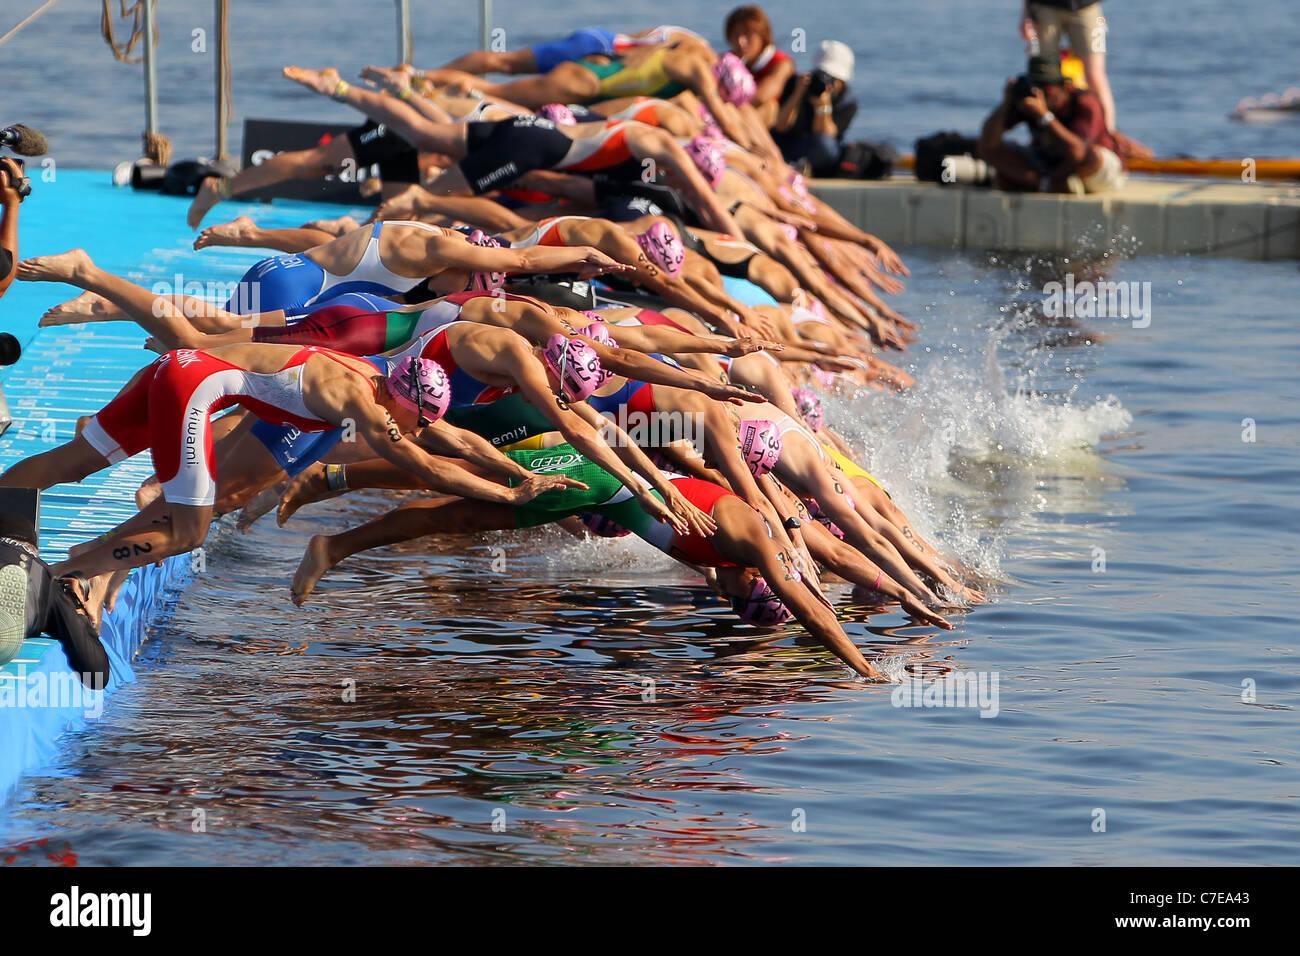 The ambiance shot of the 2011 ITU World Championship Yokohama in Yokohama. - Stock Image